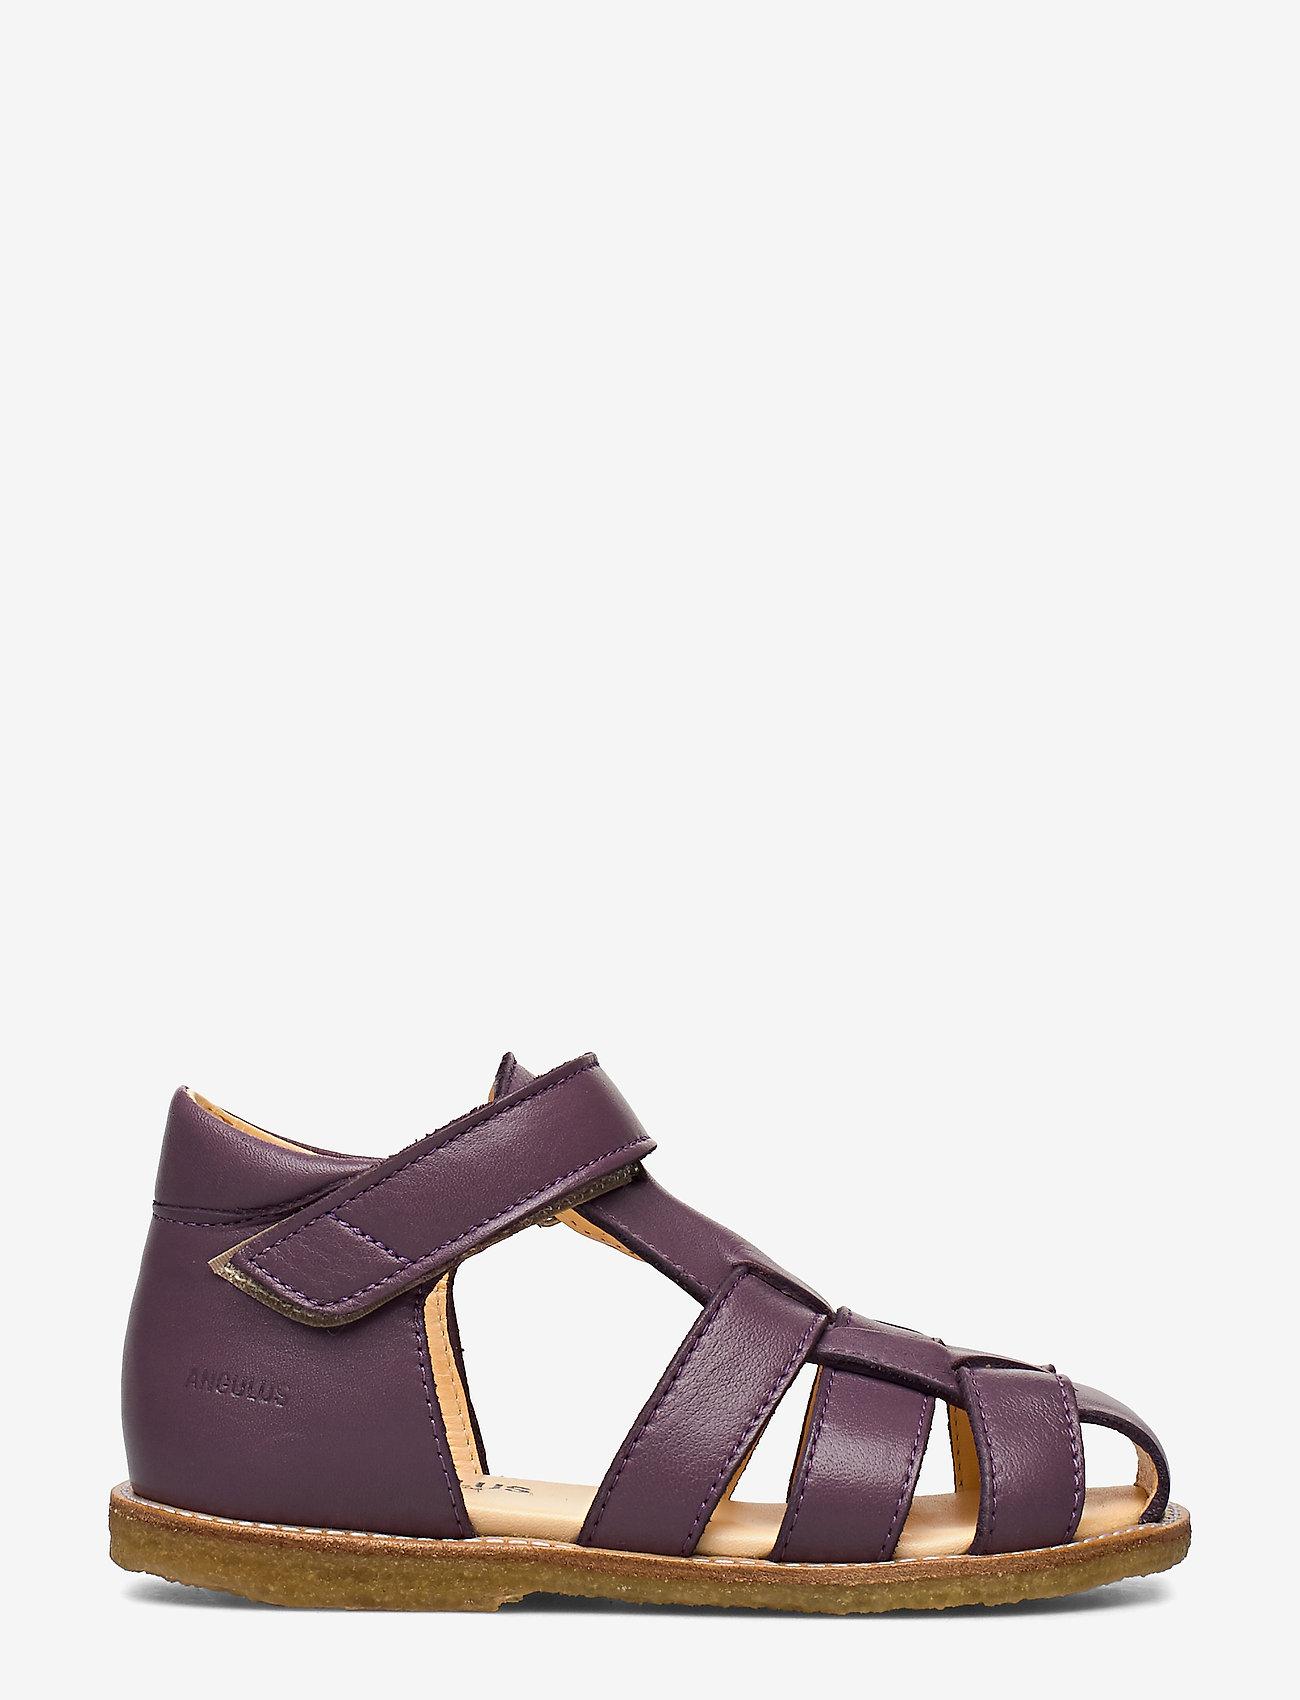 ANGULUS - Sandals - flat - closed toe -  - sandały z paskiem - 1568 lavender - 1